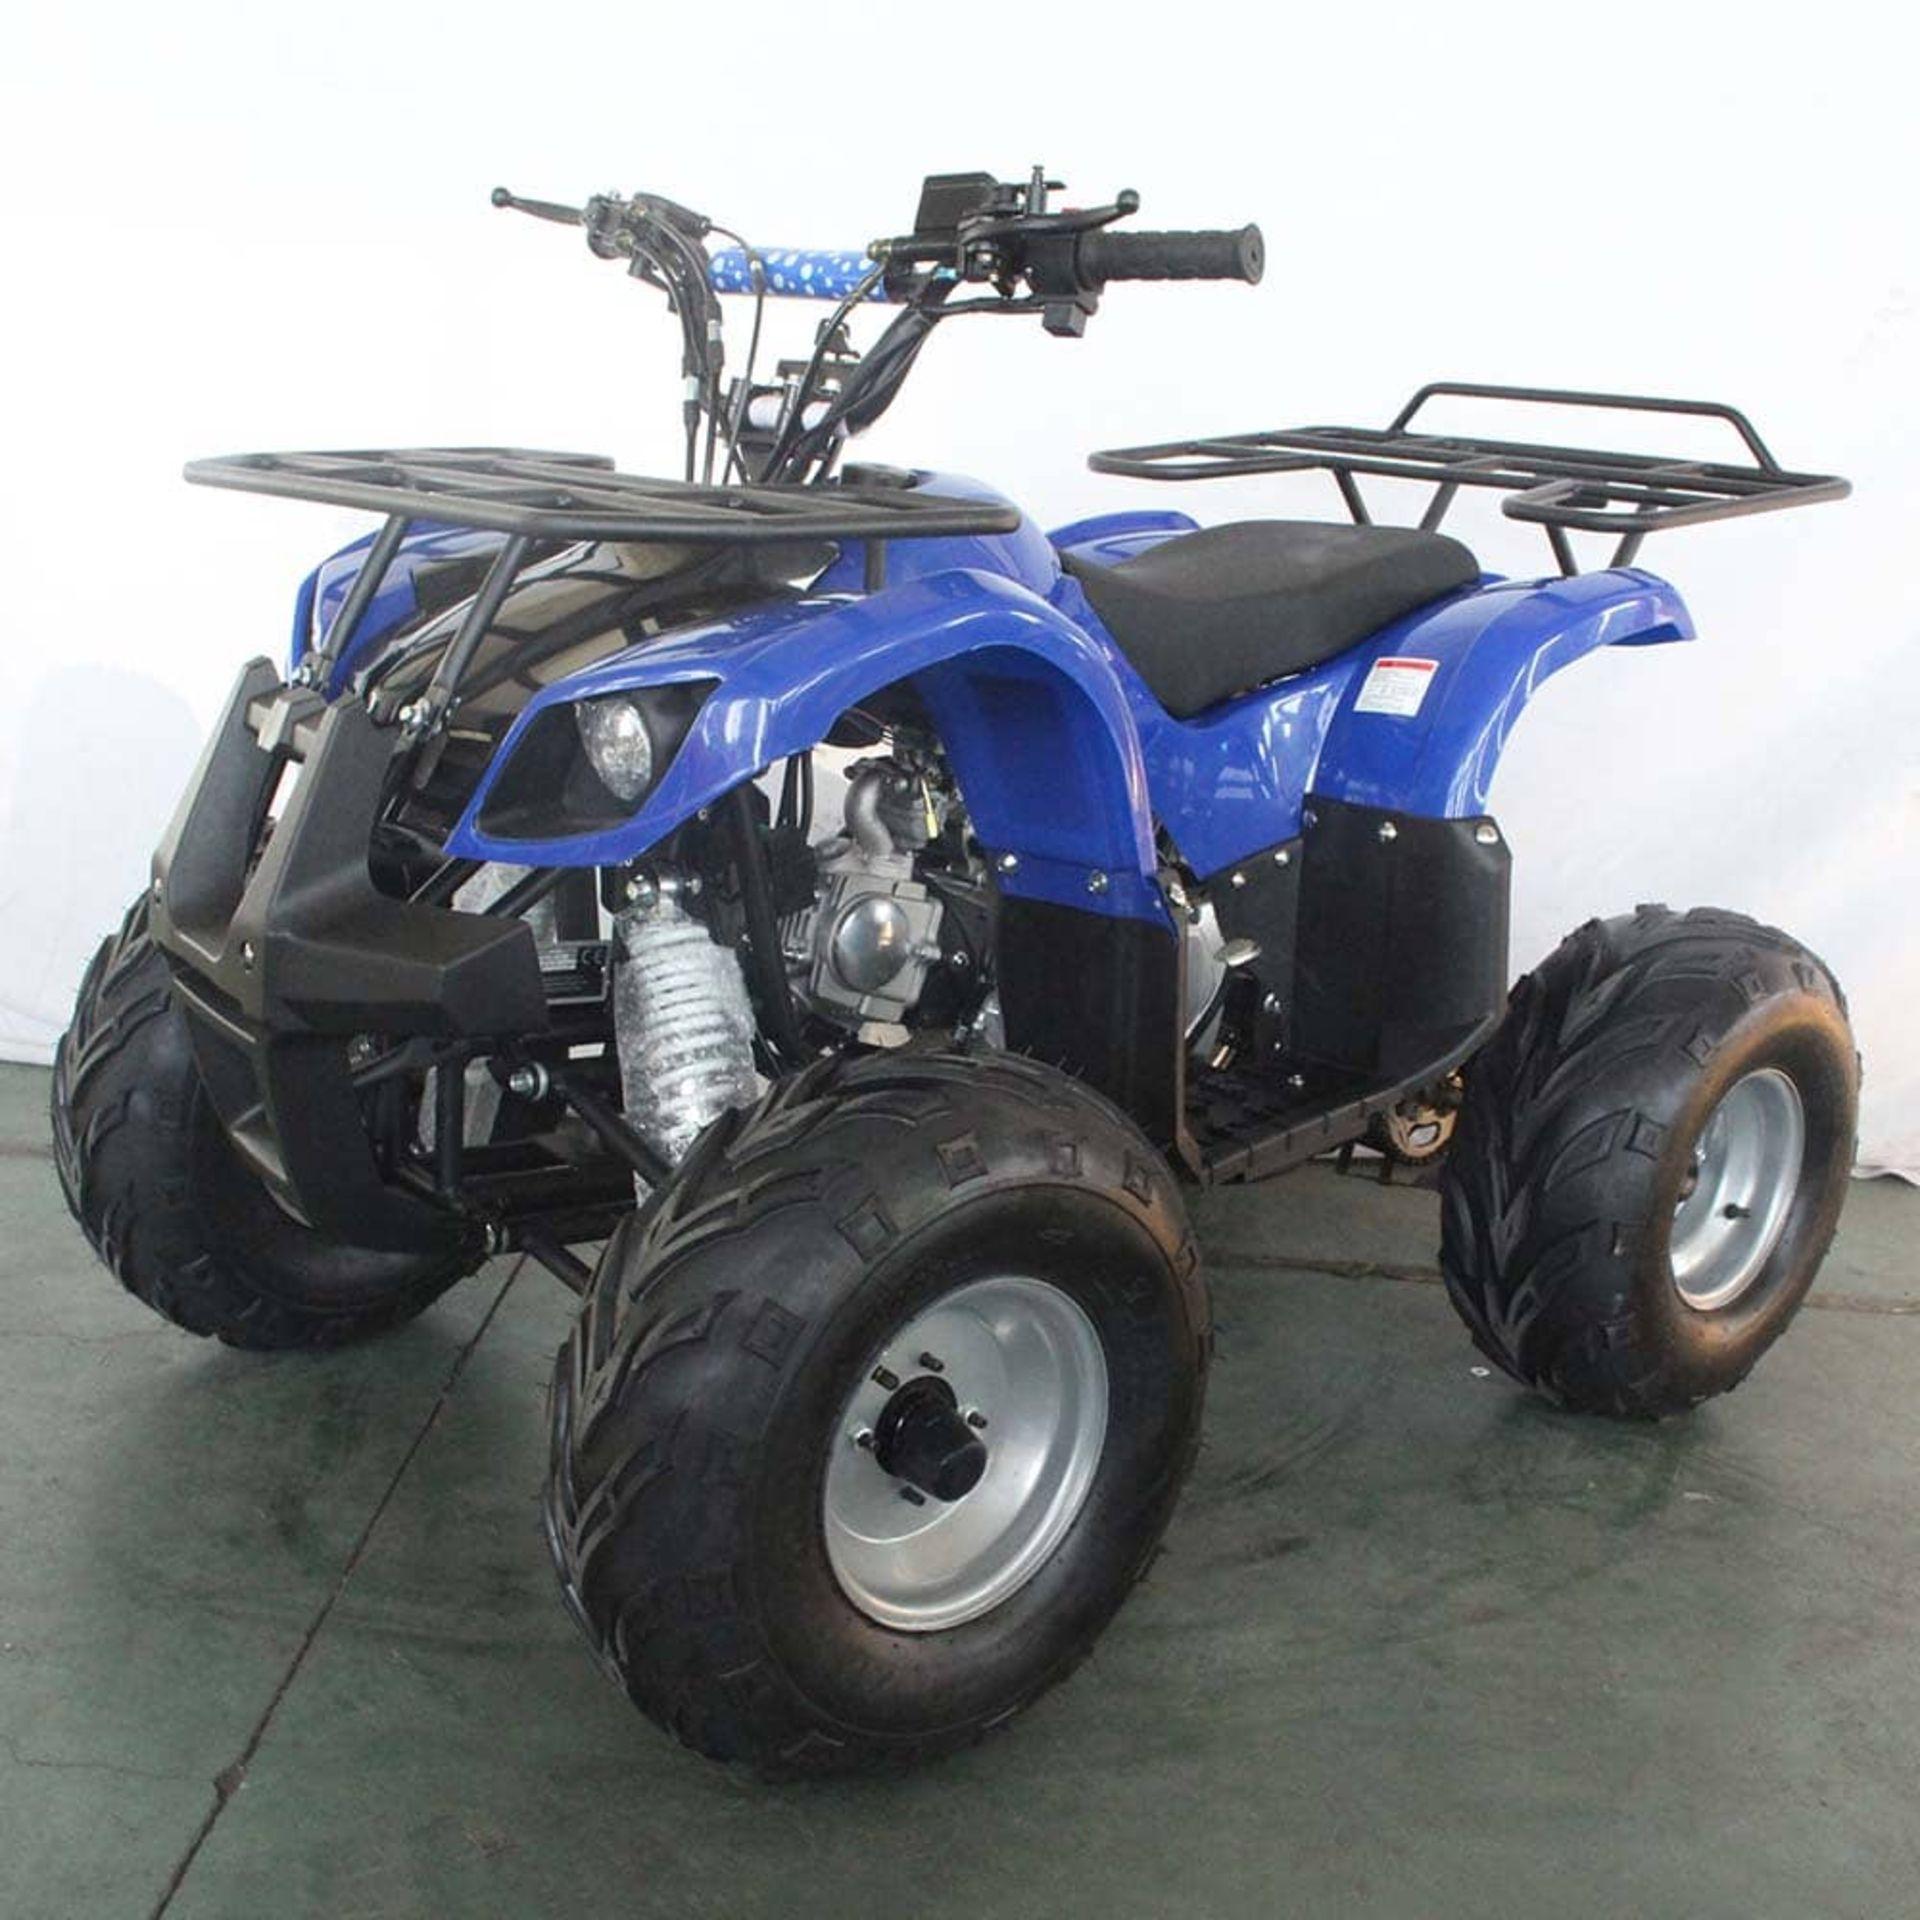 + VAT Brand New 125cc Condor Quad Bike - Four Stroke - Single Cylinder - Front Drum Brakes & Rear - Image 9 of 9